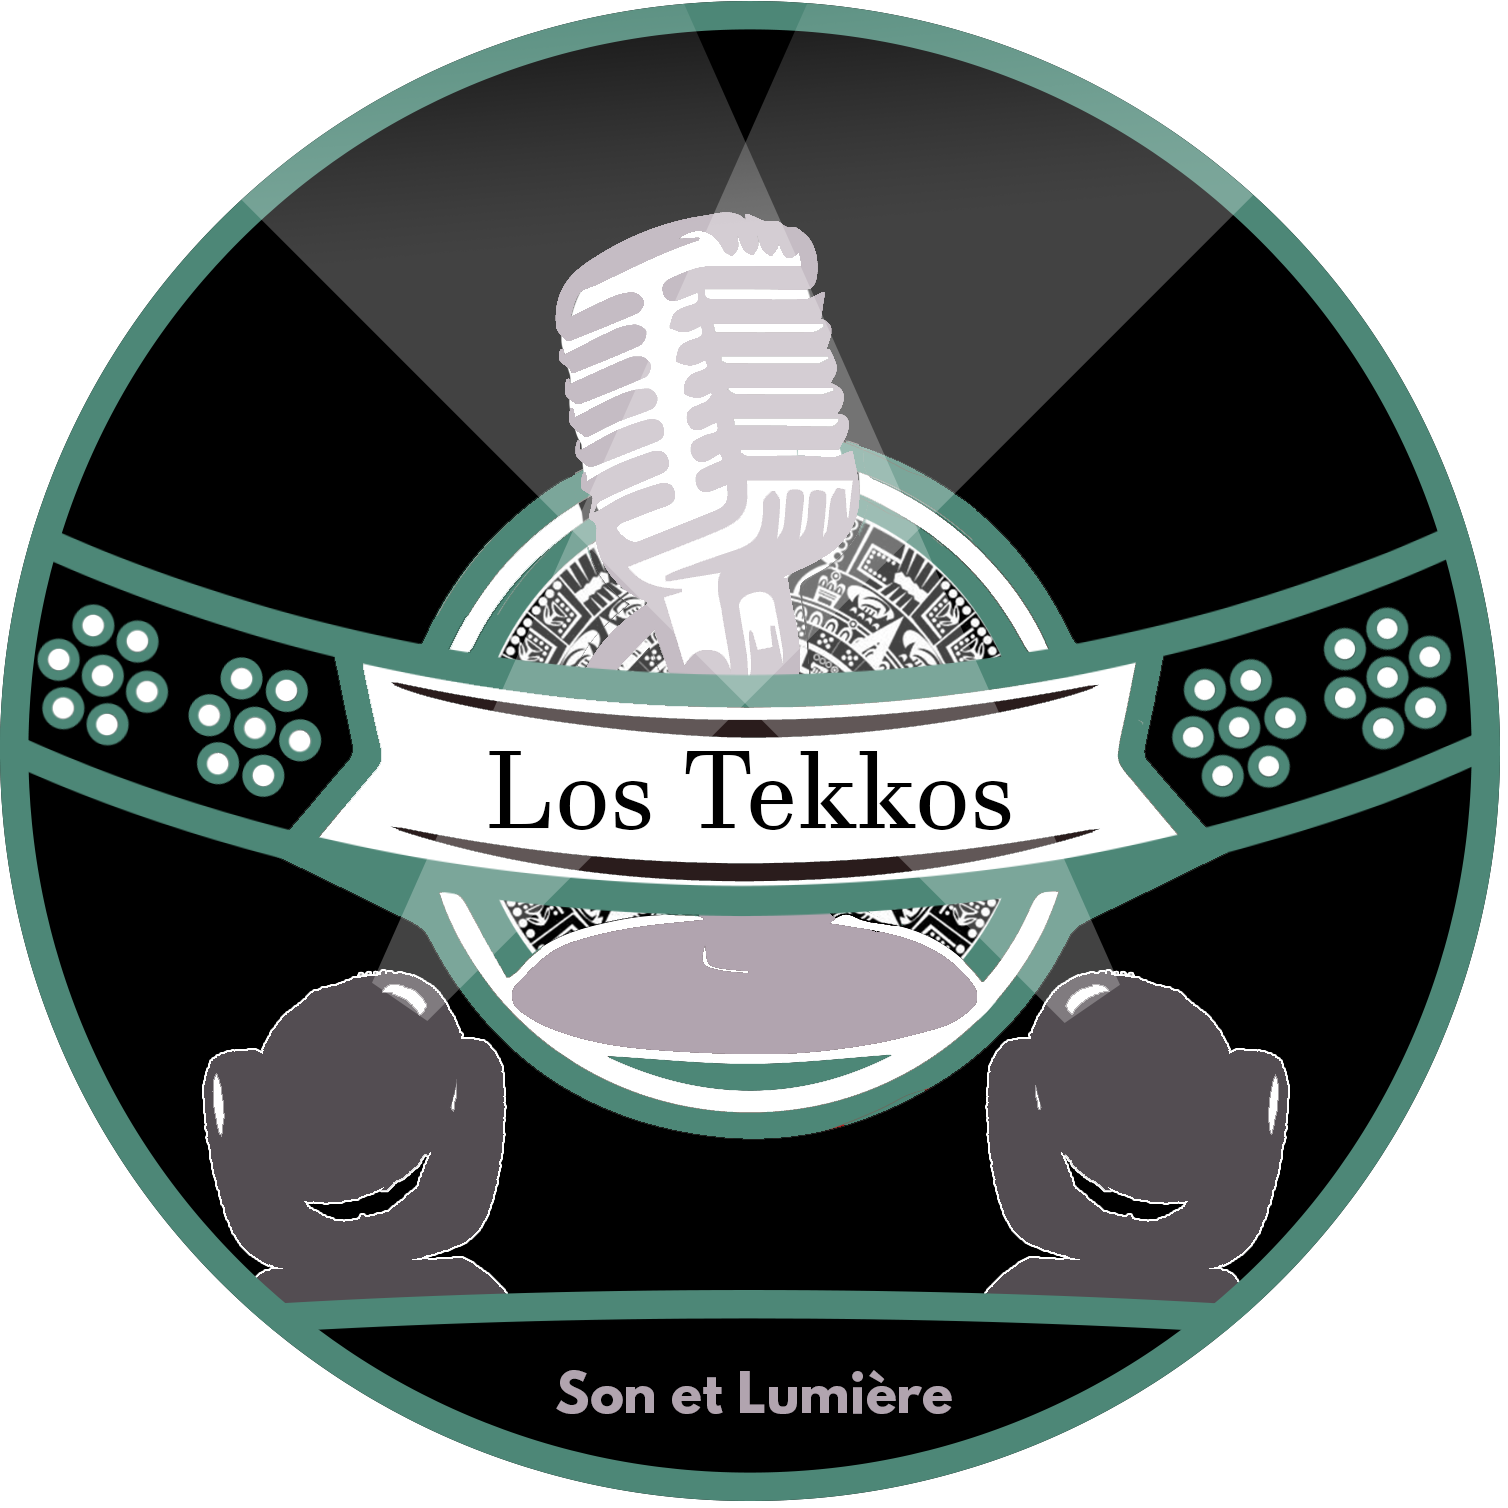 Logo du club Los Tekkos